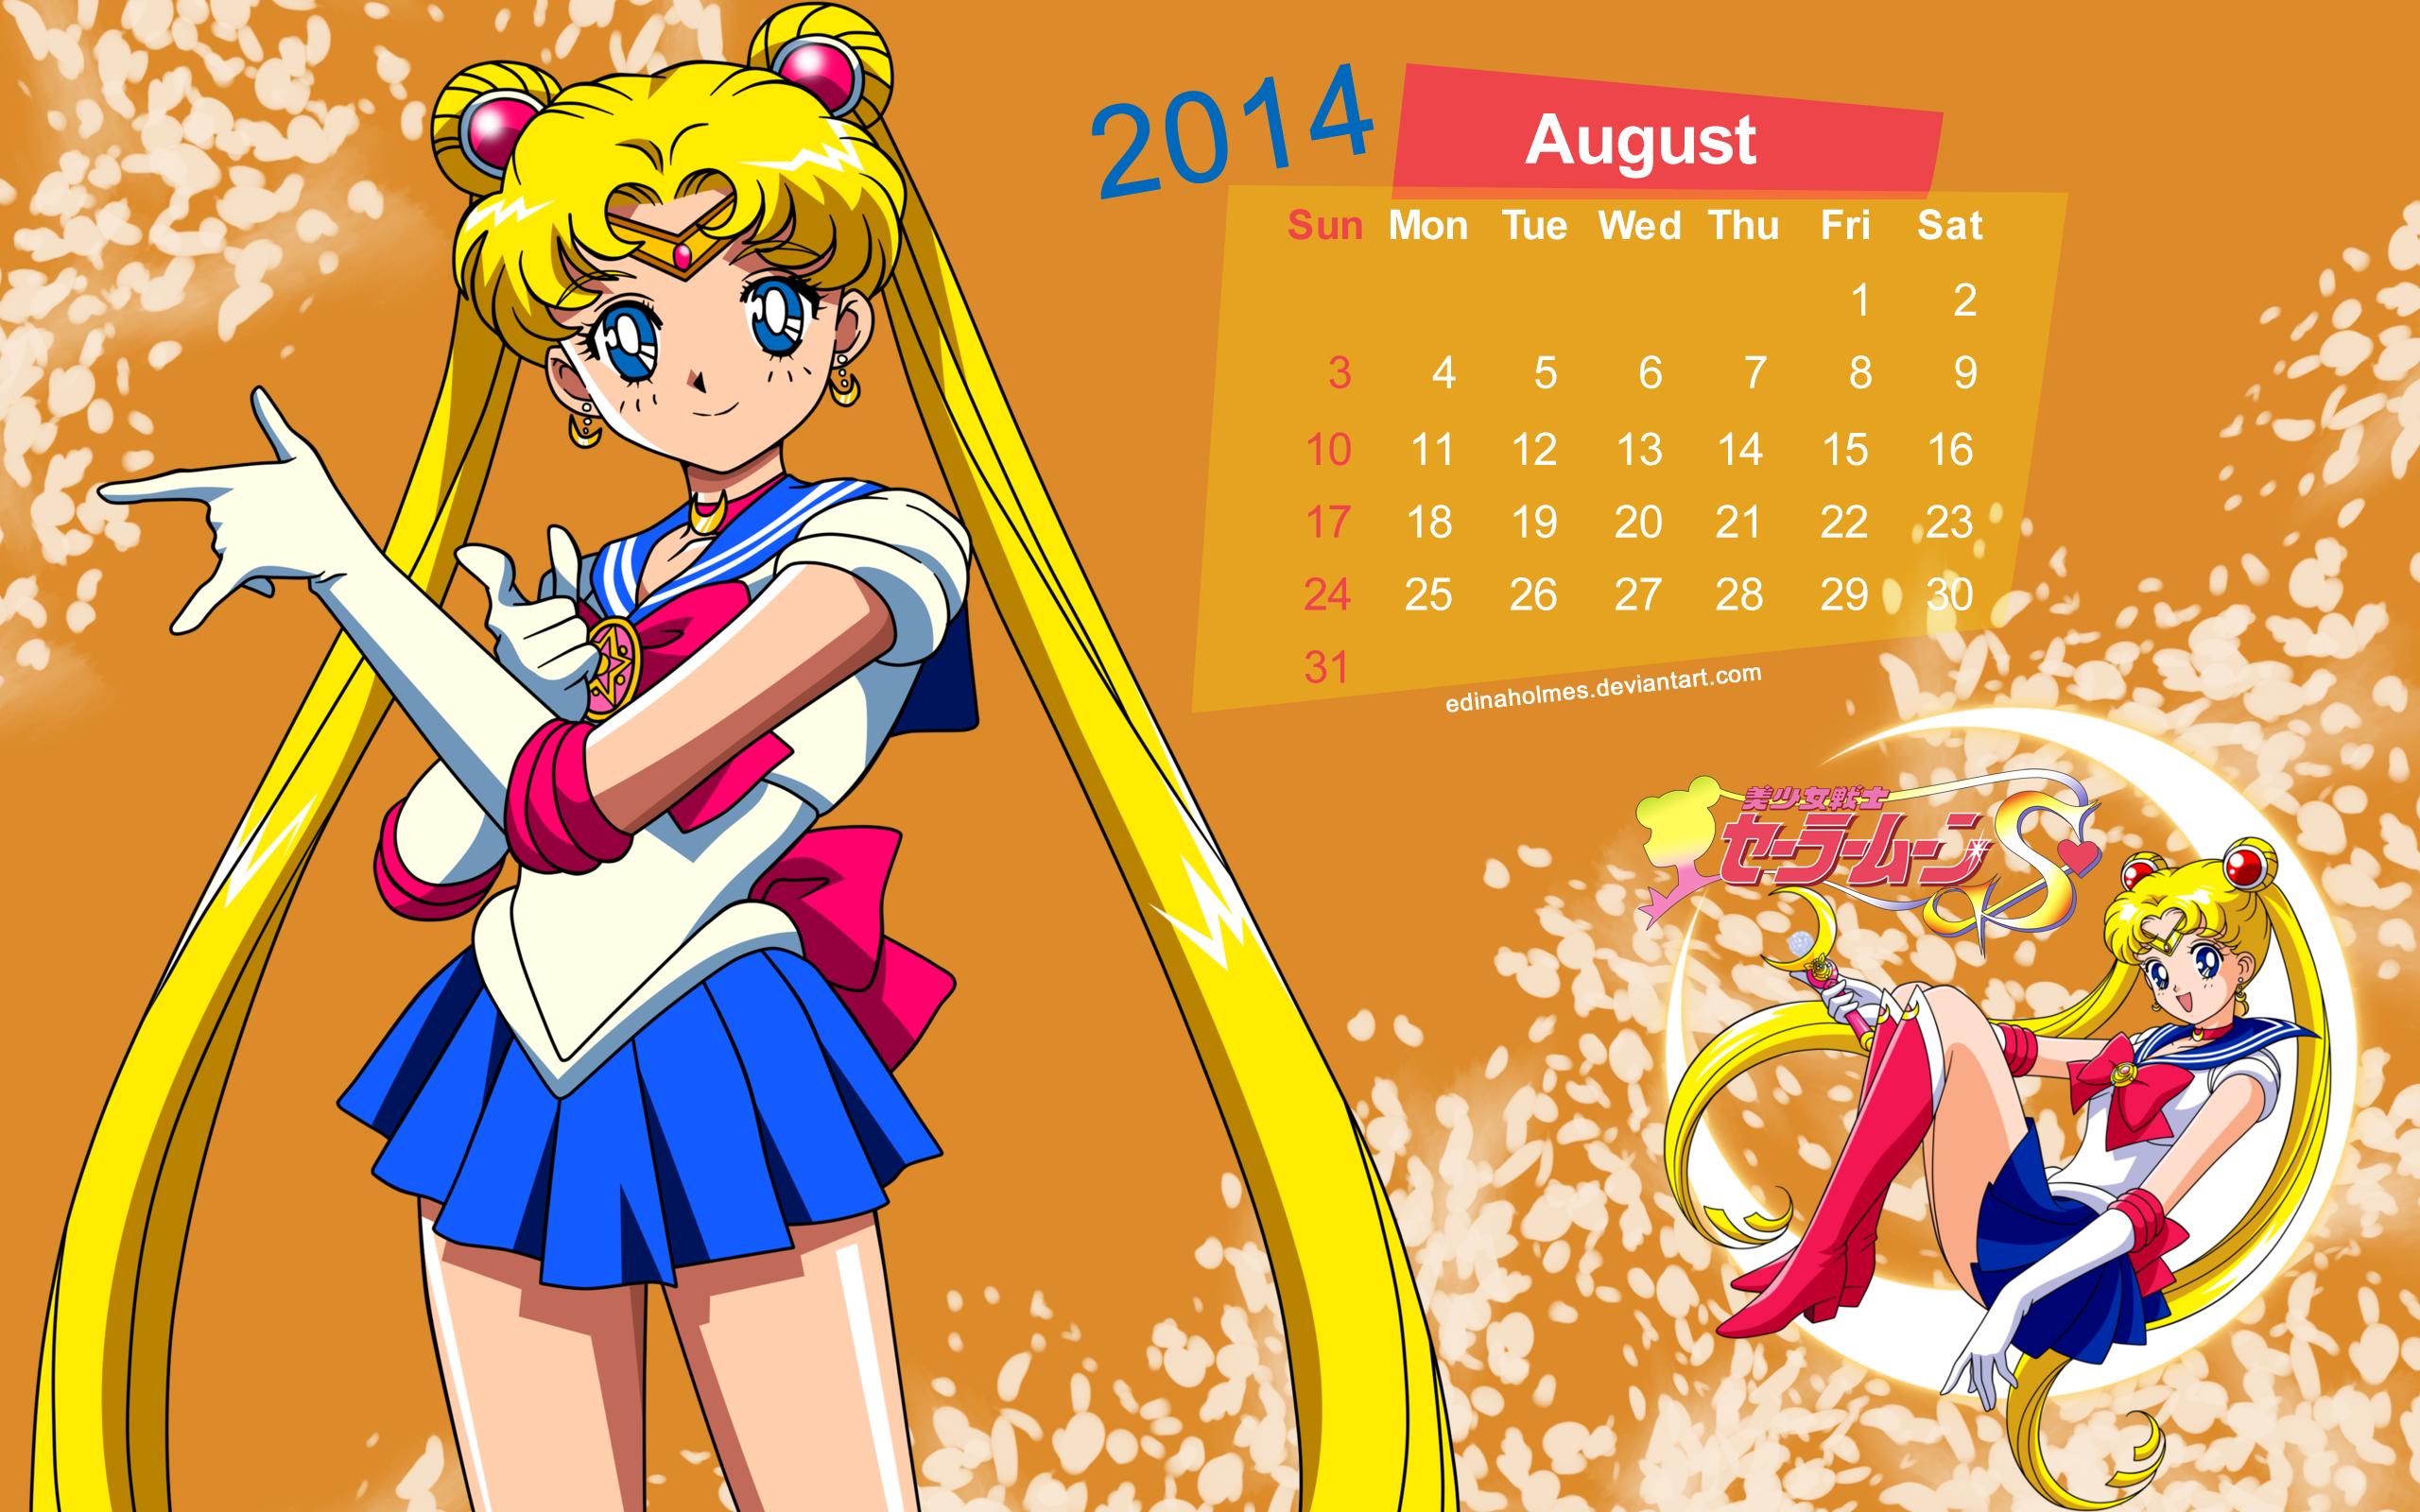 Calendar Wallpaper - August 2014 - Sailor Moon by edinaholmes